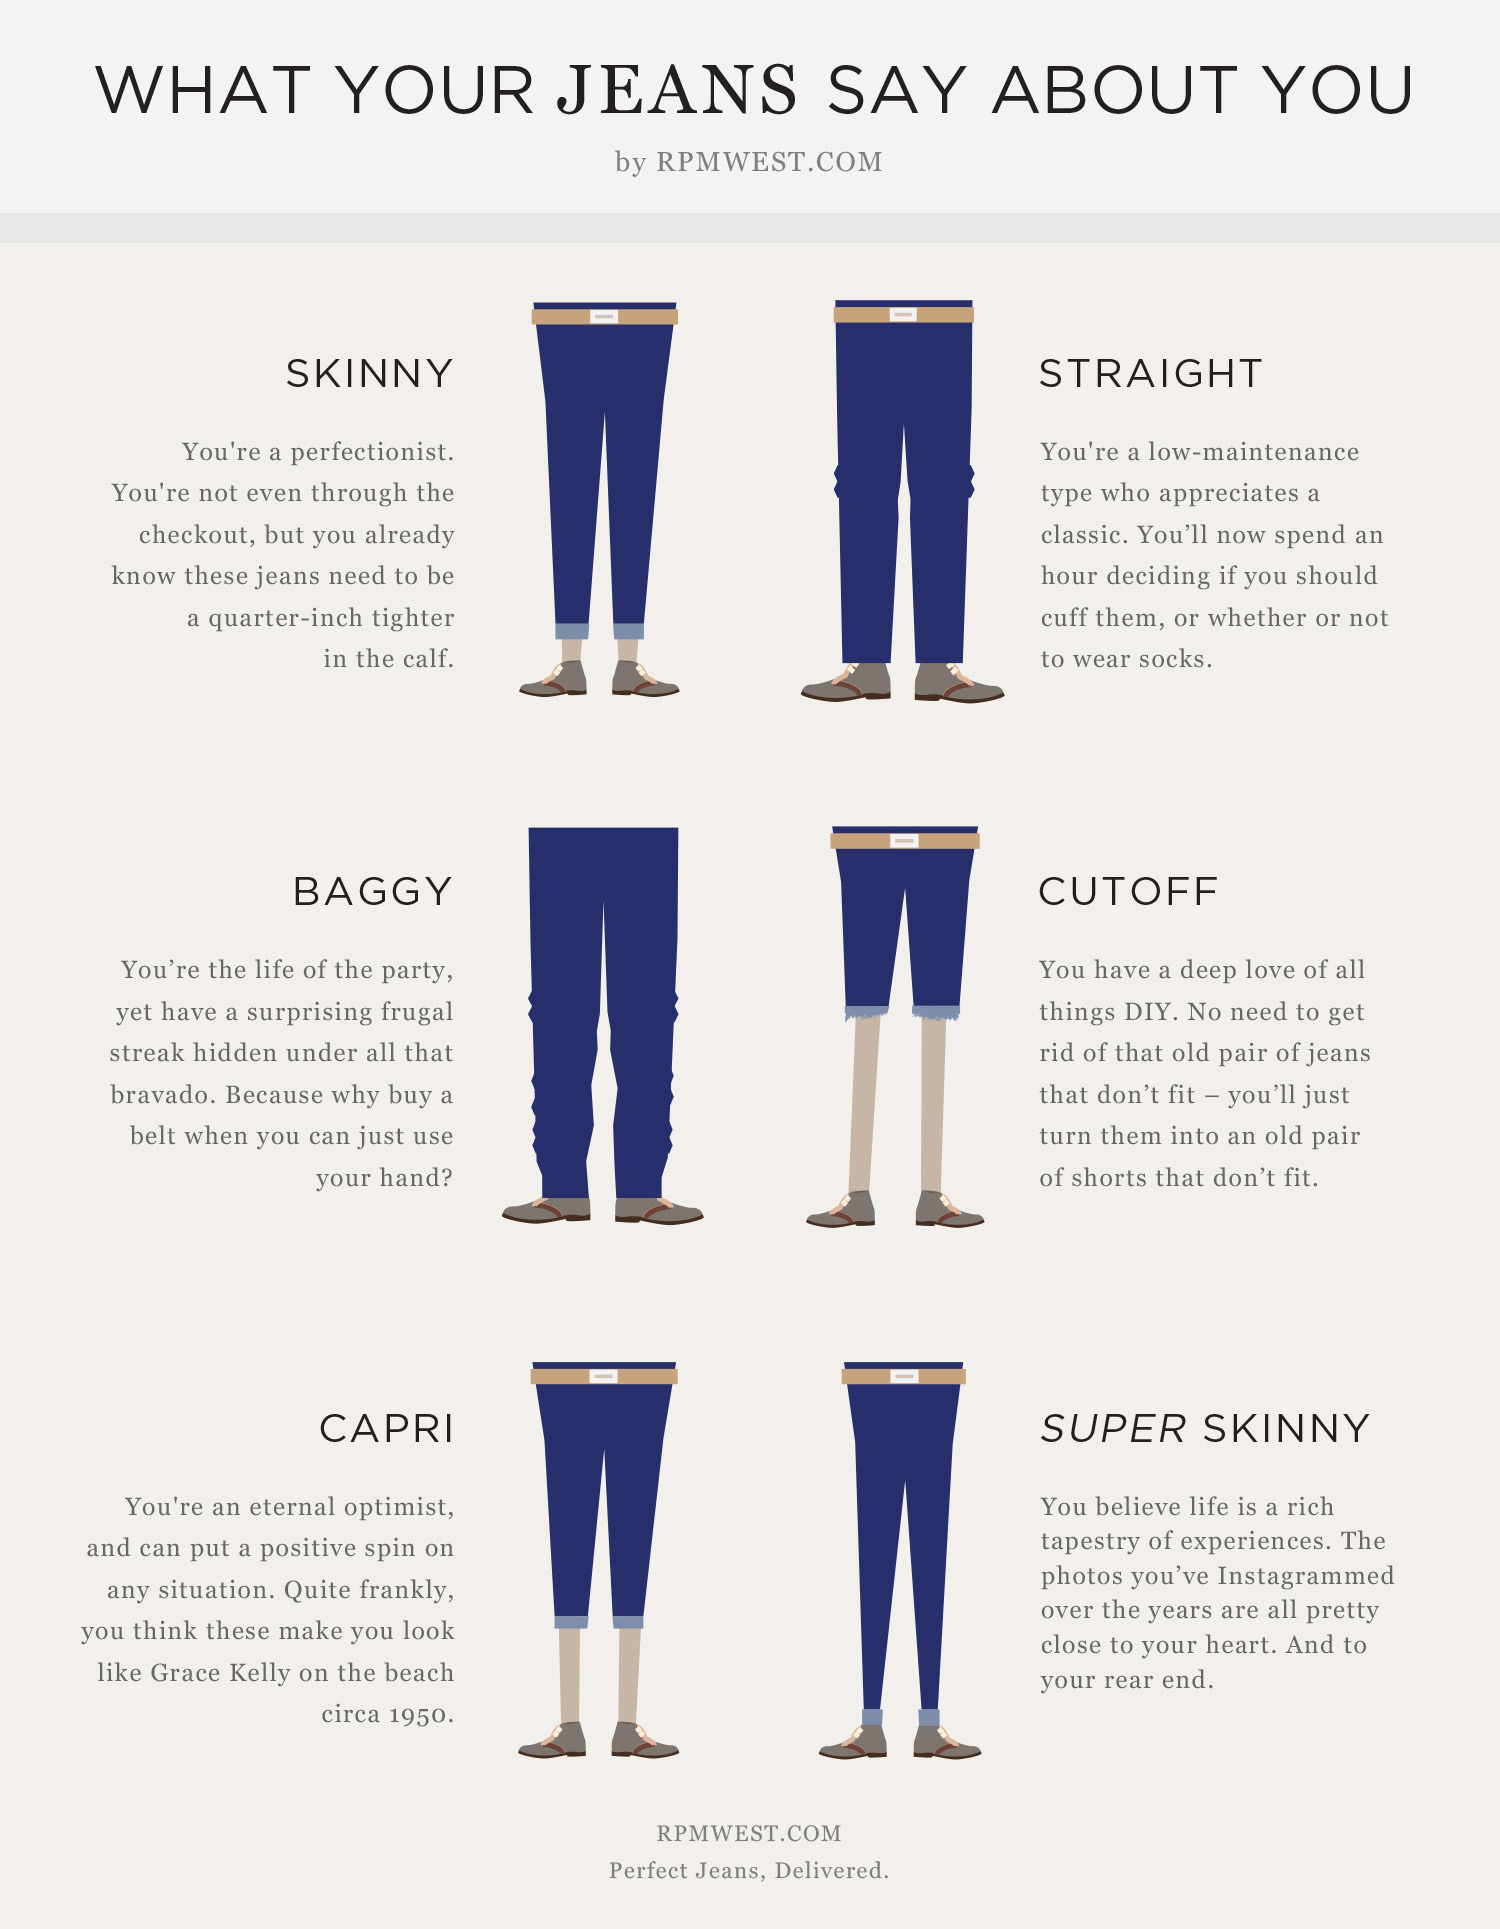 rpmwest_jeans.jpg